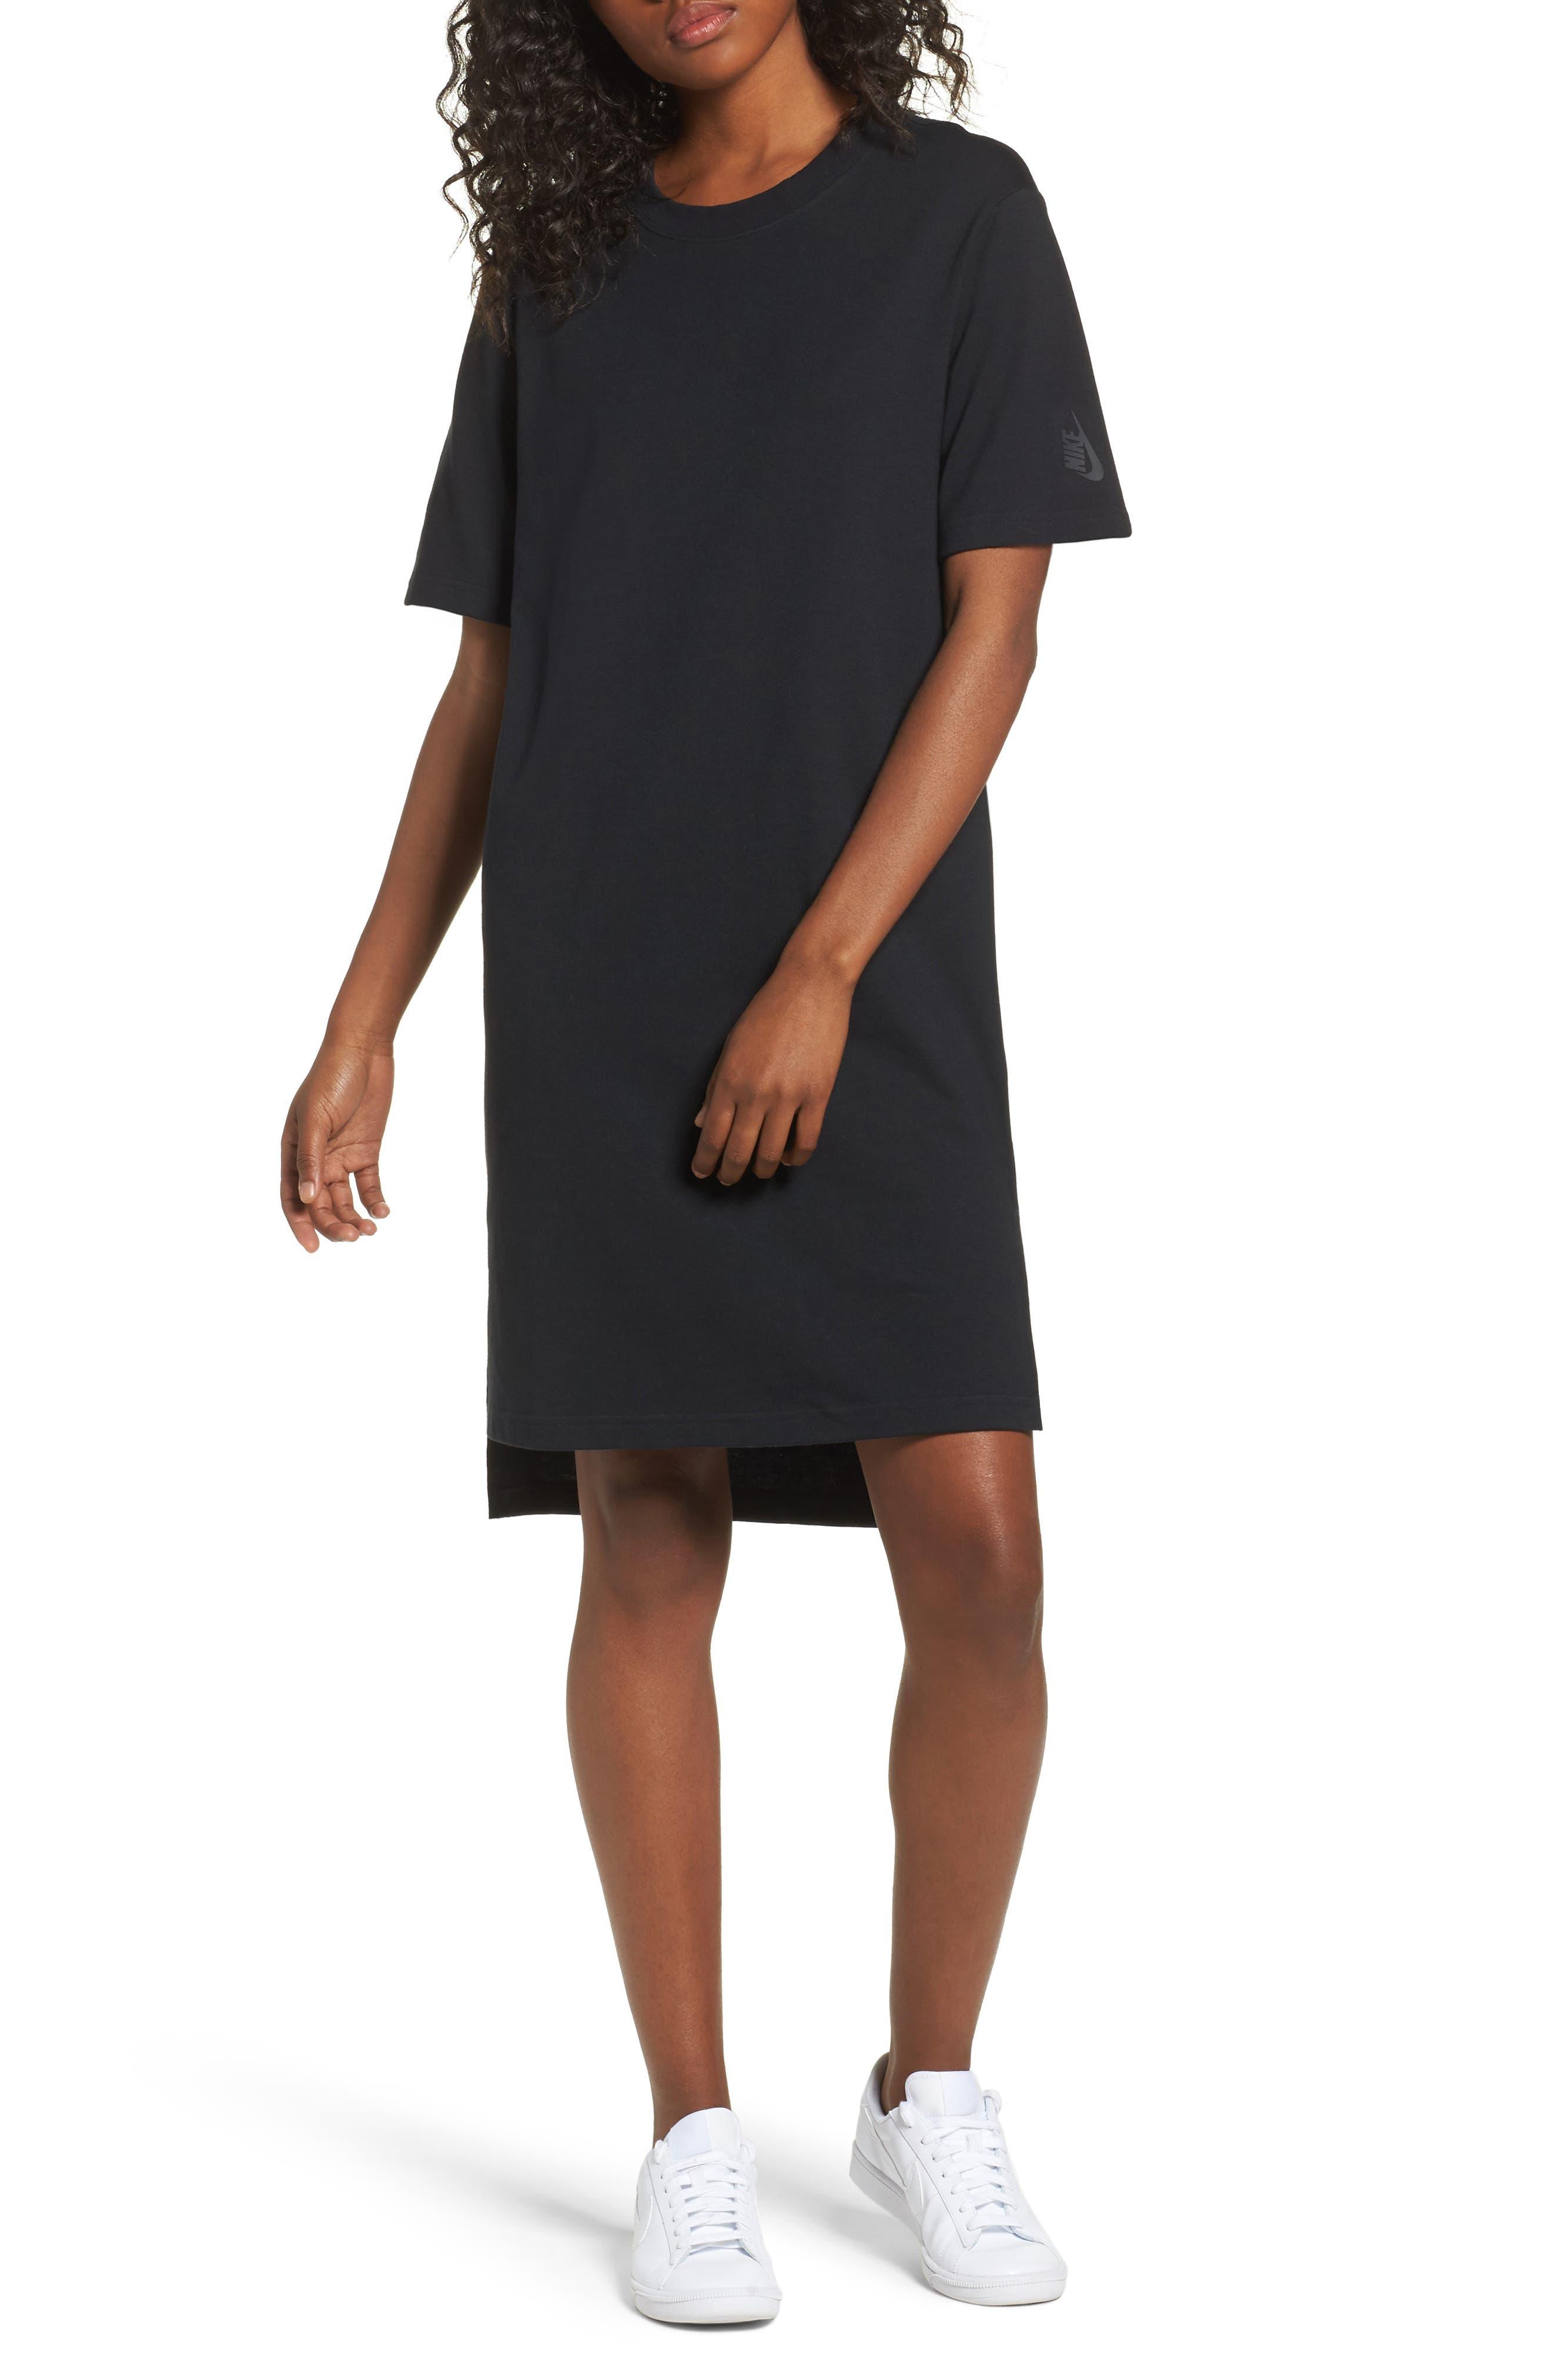 Nike NikeLab T-Shirt Dress